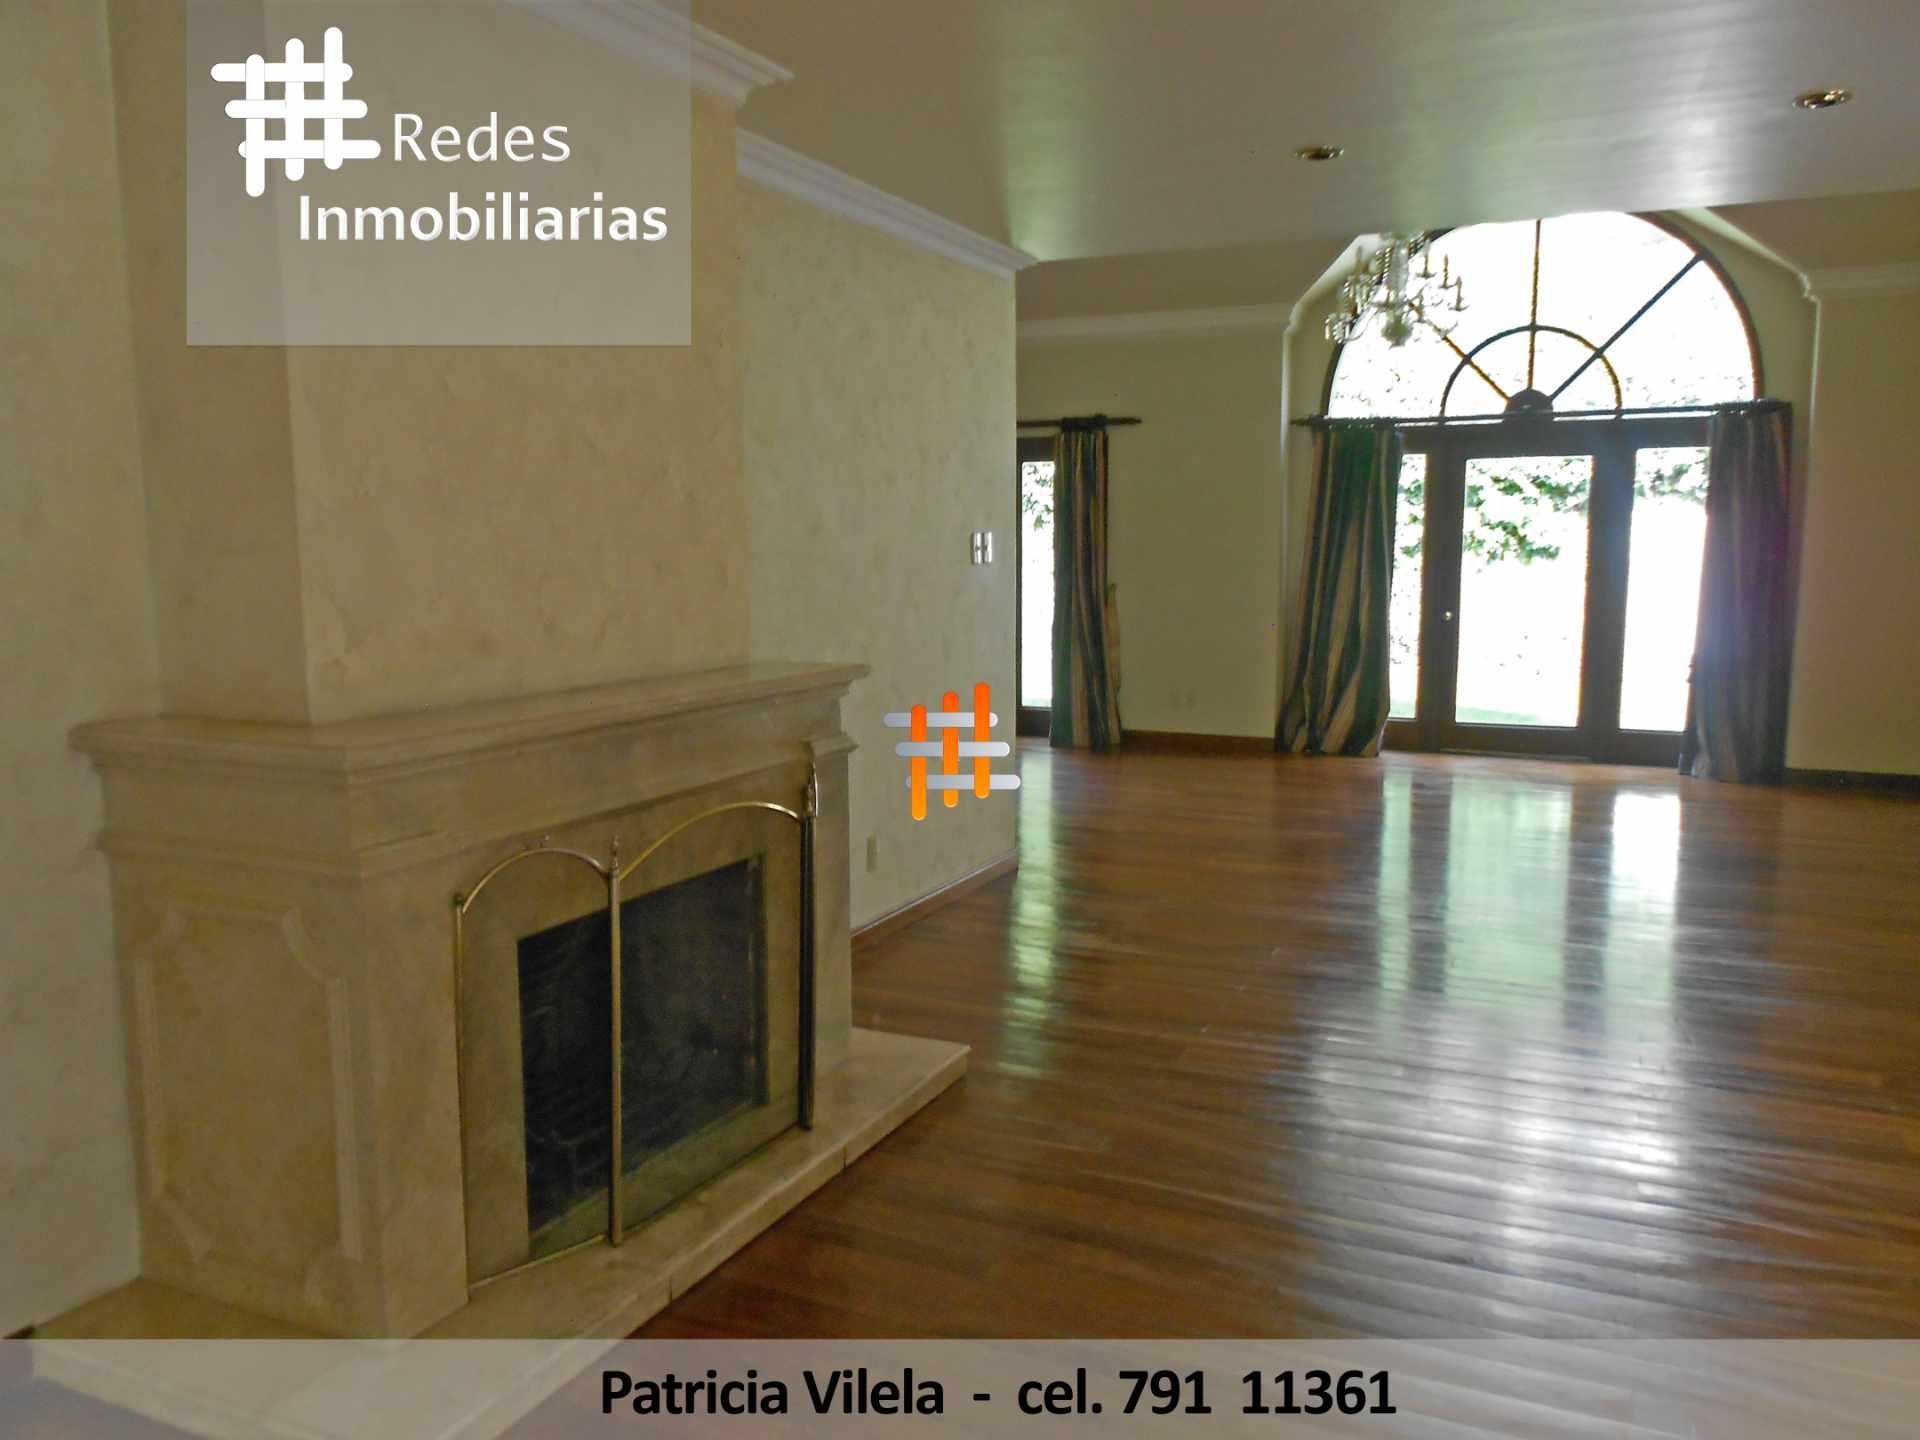 Casa en Alquiler  HERMOSA RESIDENCIA EN ALQUILER  ...ARANJUEZ Foto 11